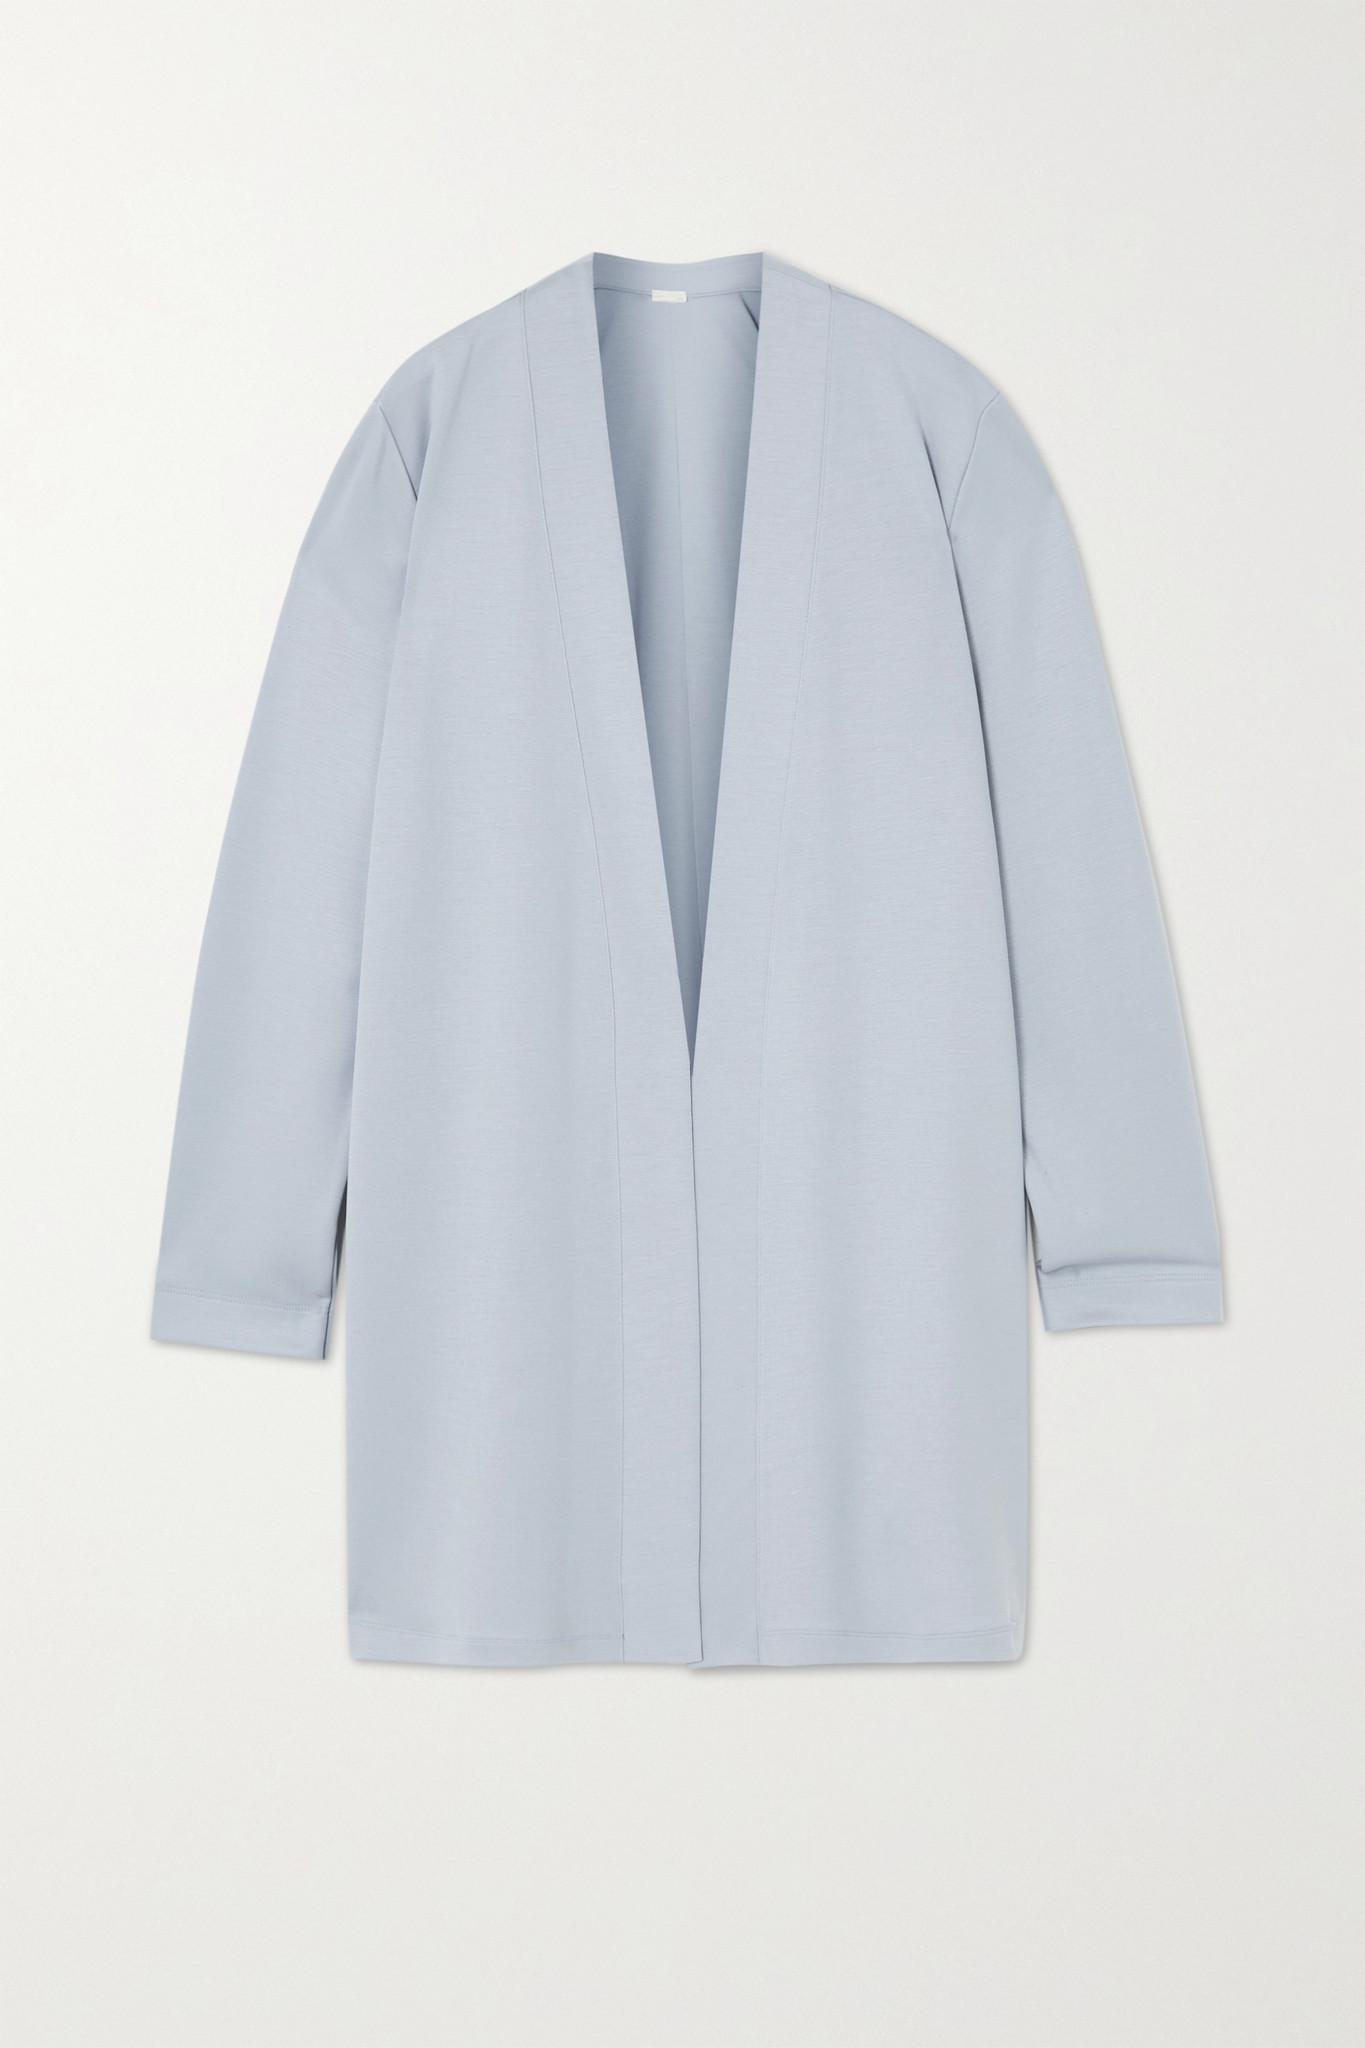 HANRO - Pure Comfort 天丝莱赛尔纤维混纺开襟衫 - 灰色 - small